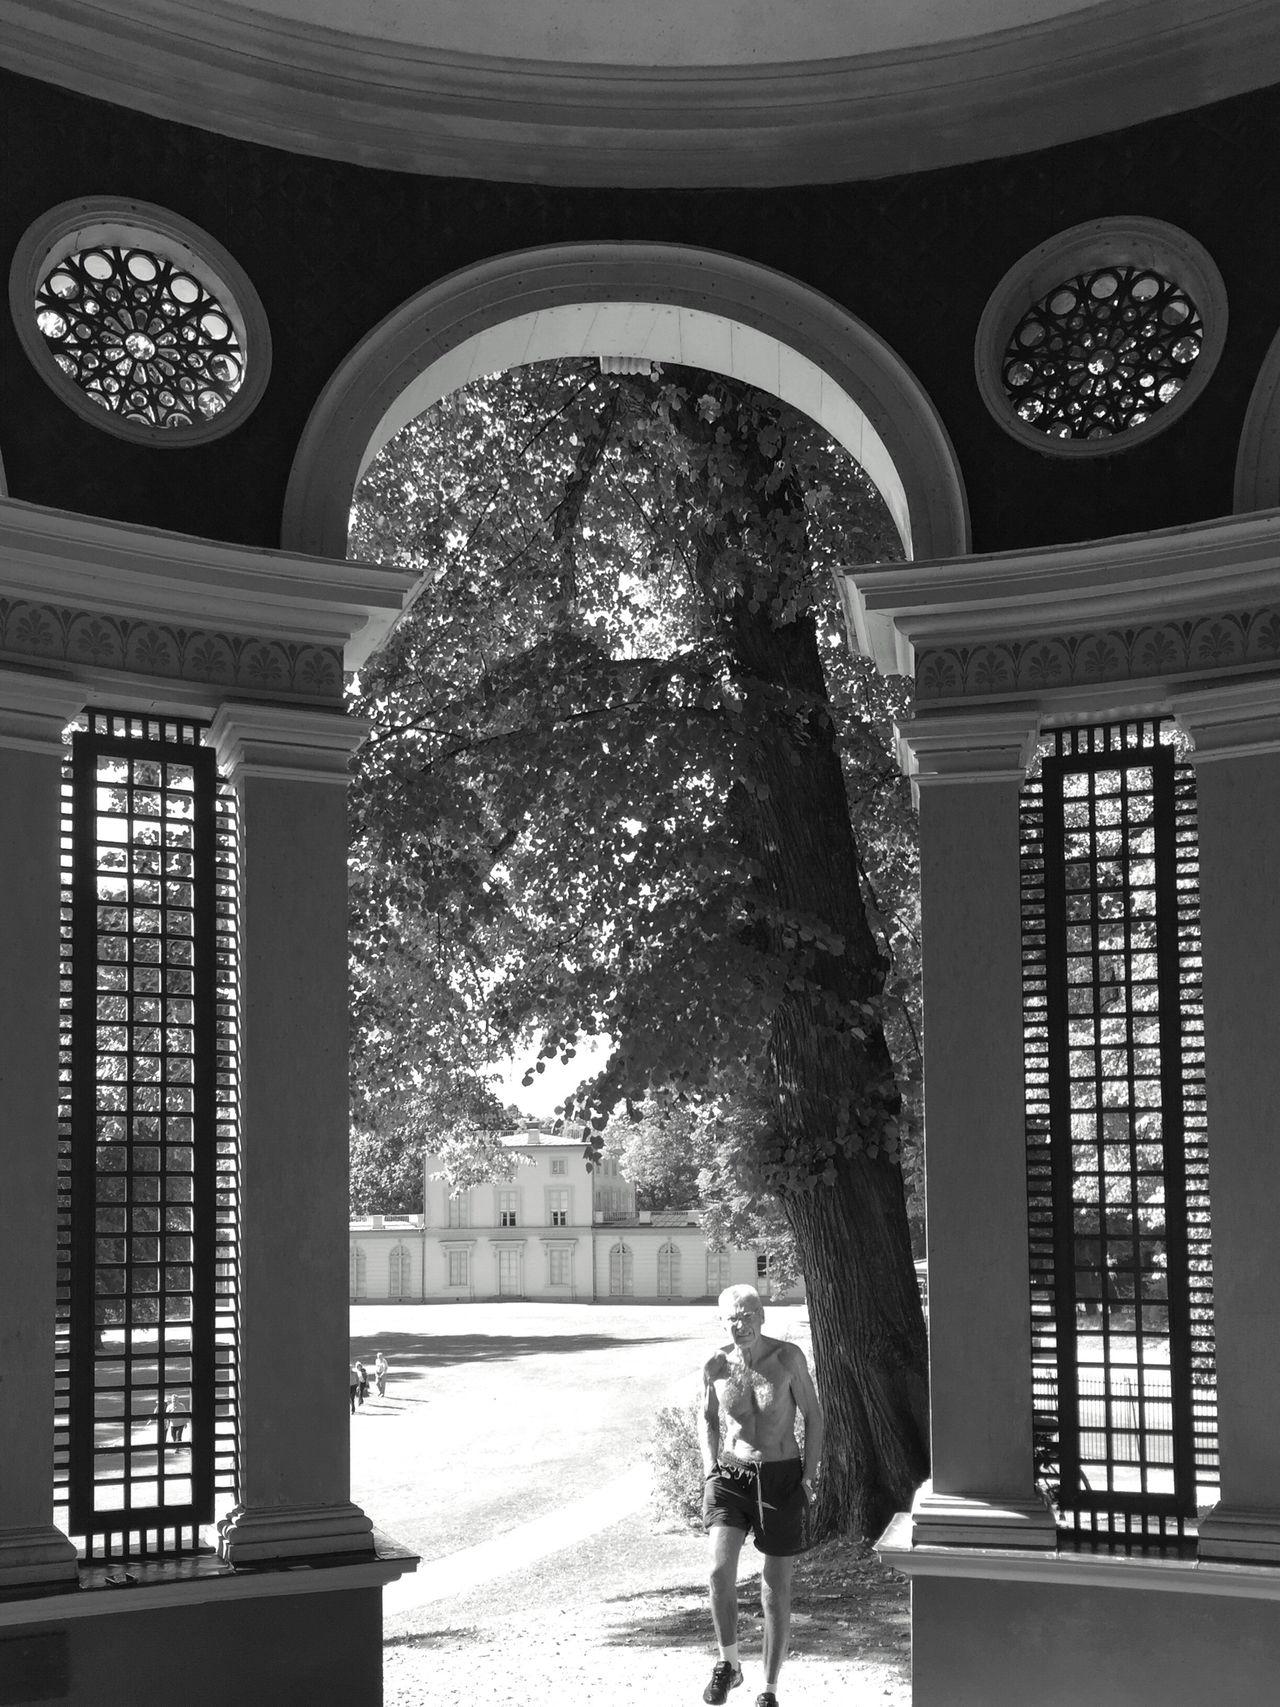 Full Length Tree Window Arch Built Structure Architecture Entrance Day Arched EyeEm Black&white! Streetphoto_bw Street Scene Shadows EyeEm Bnw Bw_collection Walking EyeEm EyeEm Team EyeEm Best Shots Architecture Blanco Y Negro Minimalism_bw